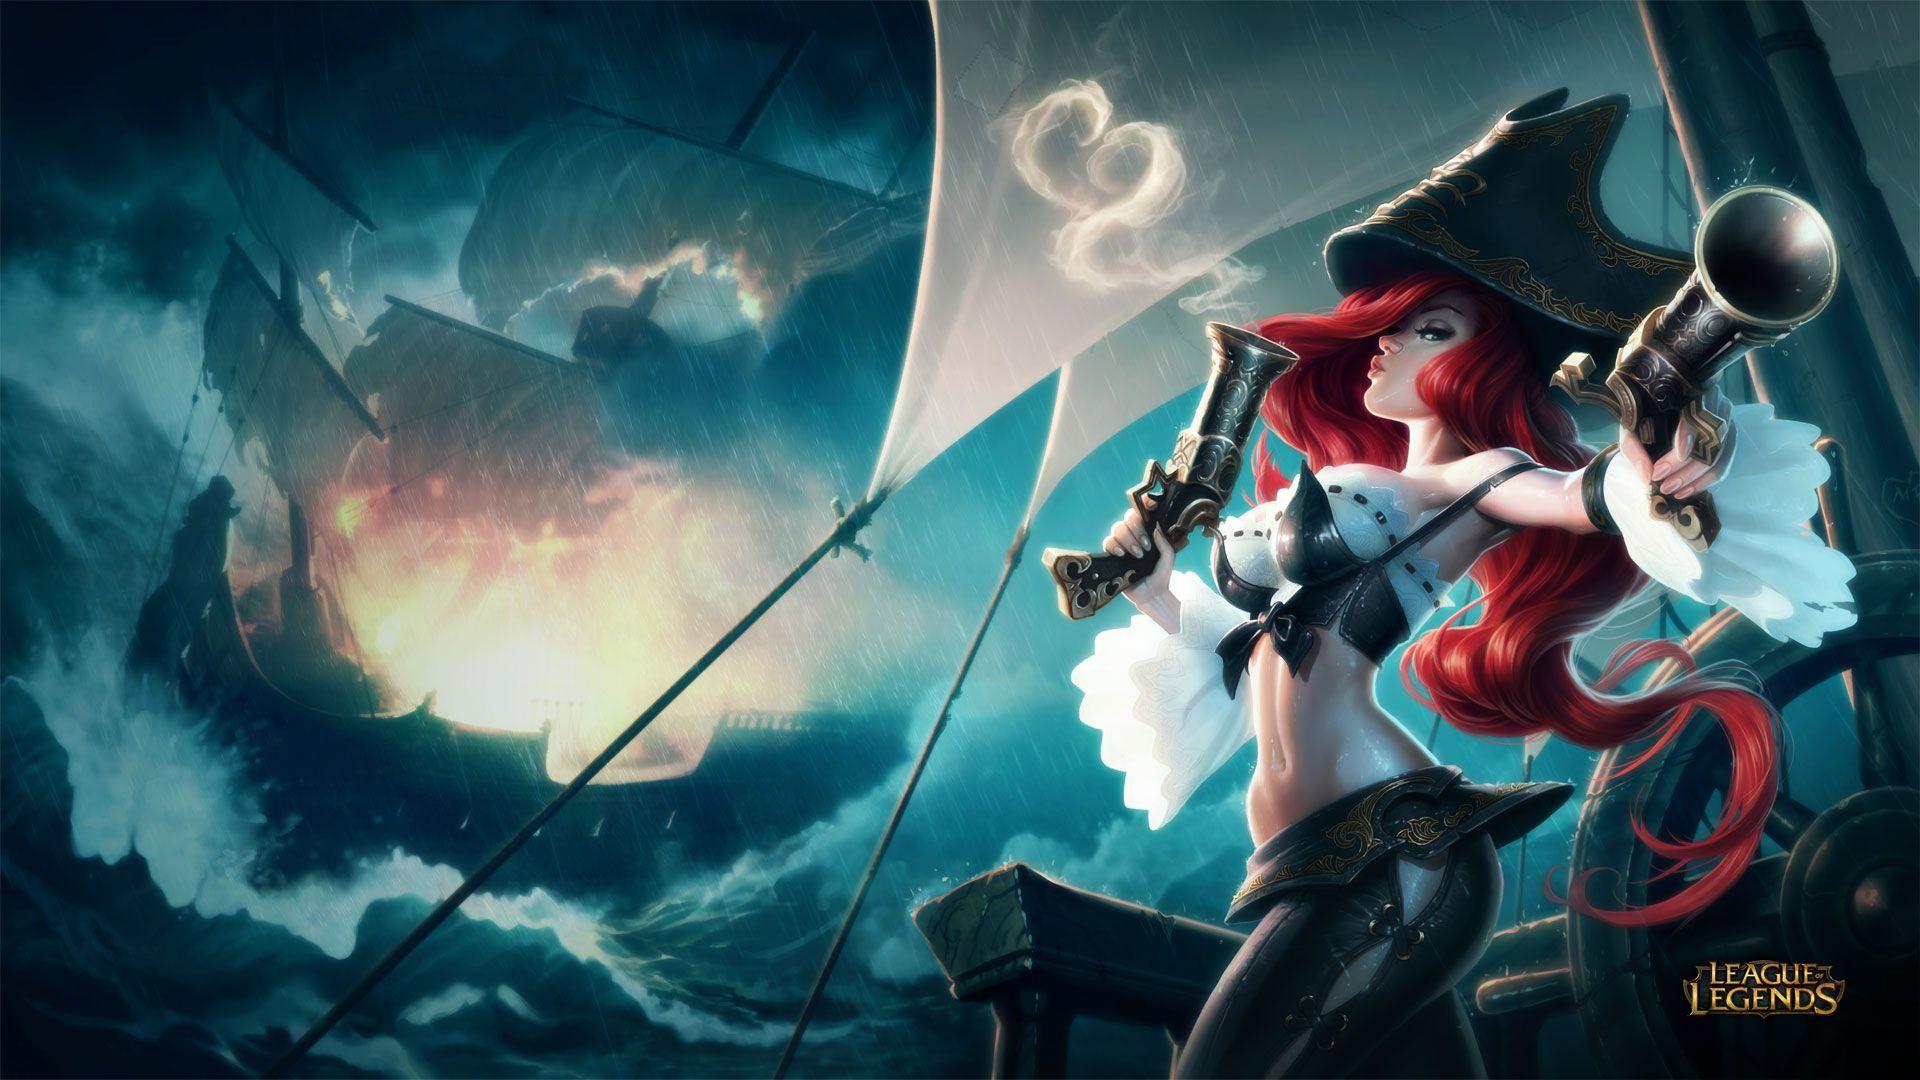 League Of Legends 4k Wallpaper: League Of Legends Wallpapers And Photos 4K Full HD